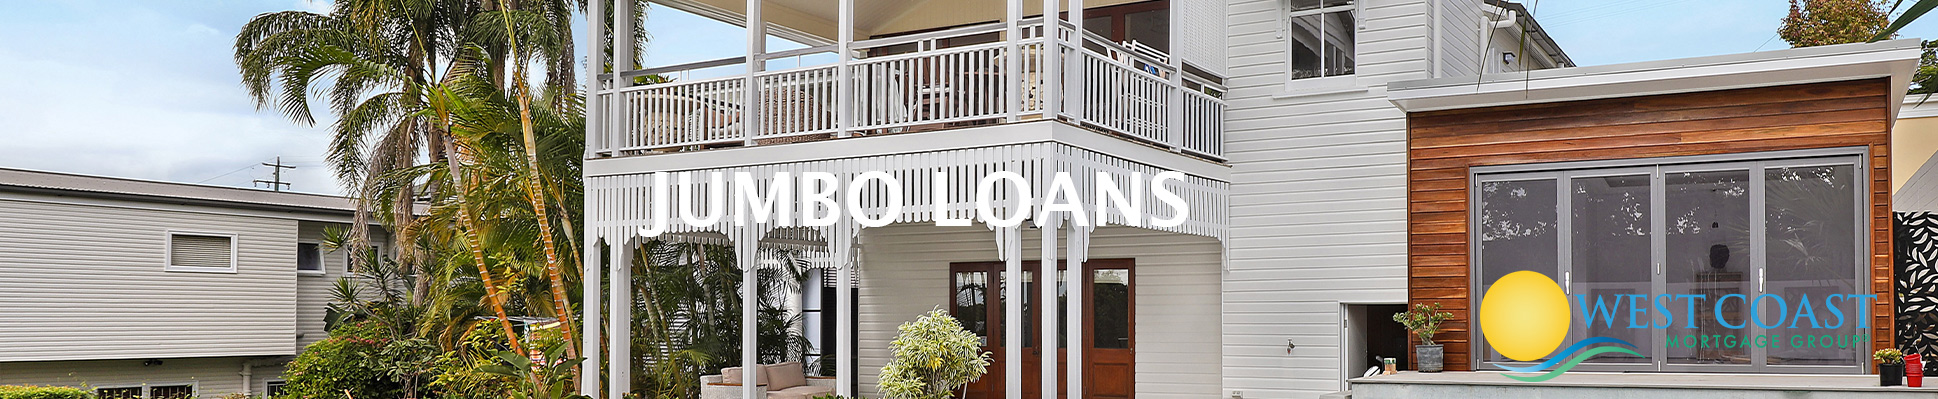 jumbo loans west coast mortgage group